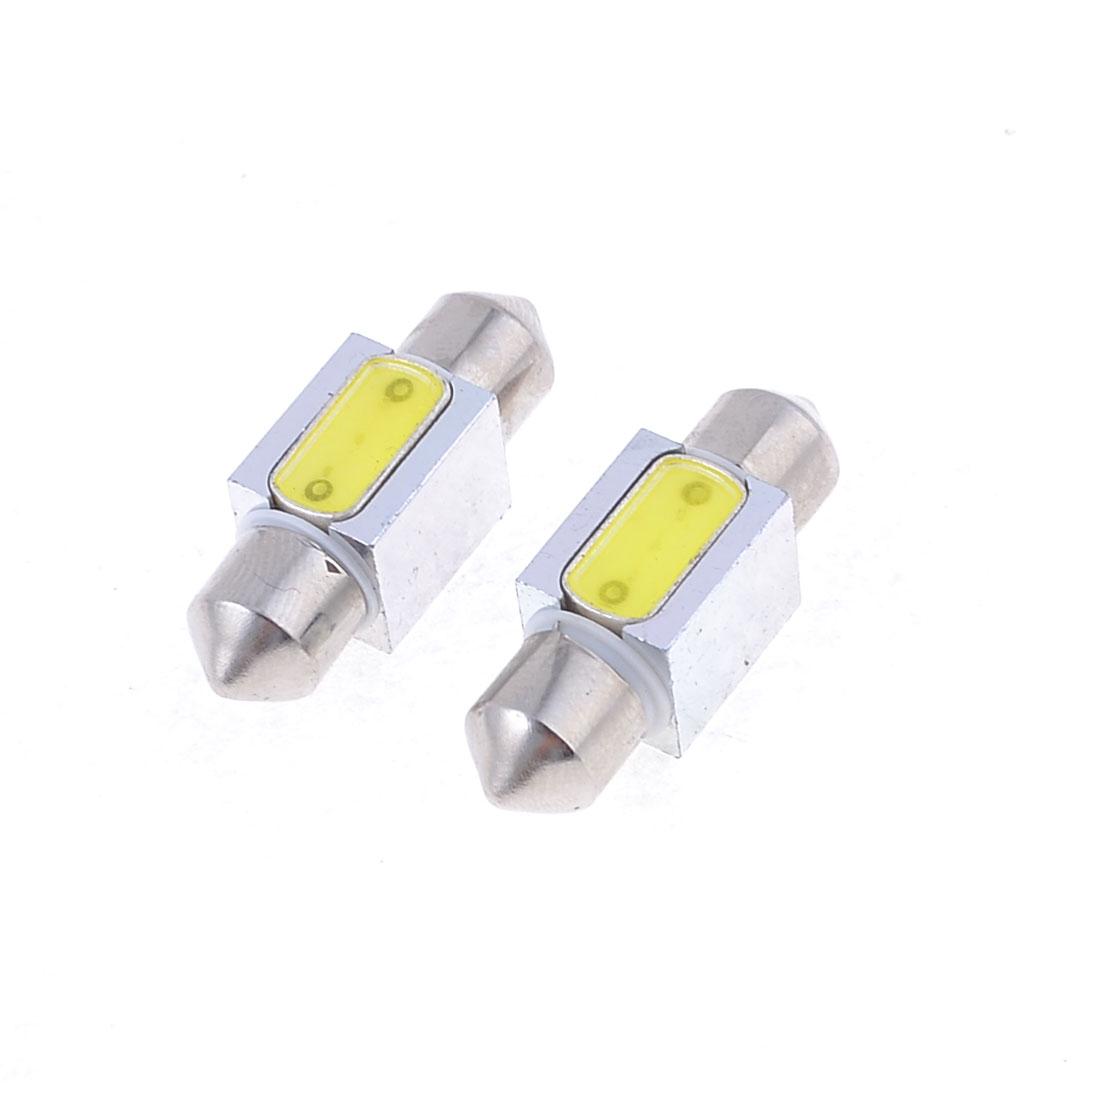 "2pcs White LED 3W 31mm 1.25"" Festoon Dome Light Lamp Bulb DE3175 internal"